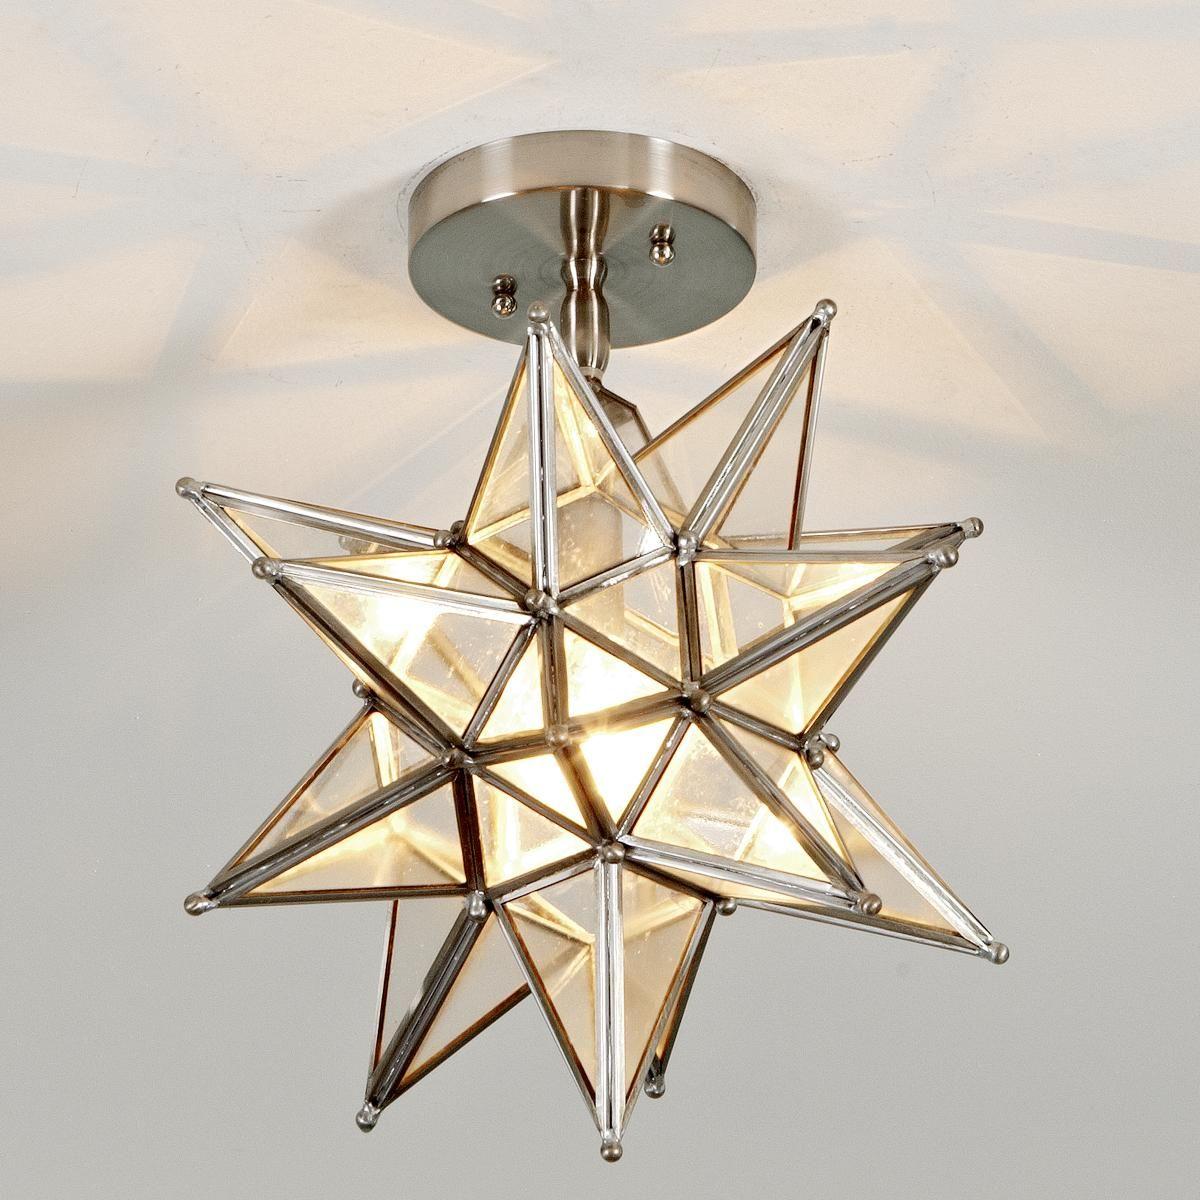 Moravian Star Ceiling Light Star Lights On Ceiling Moravian Star Ceiling Lights